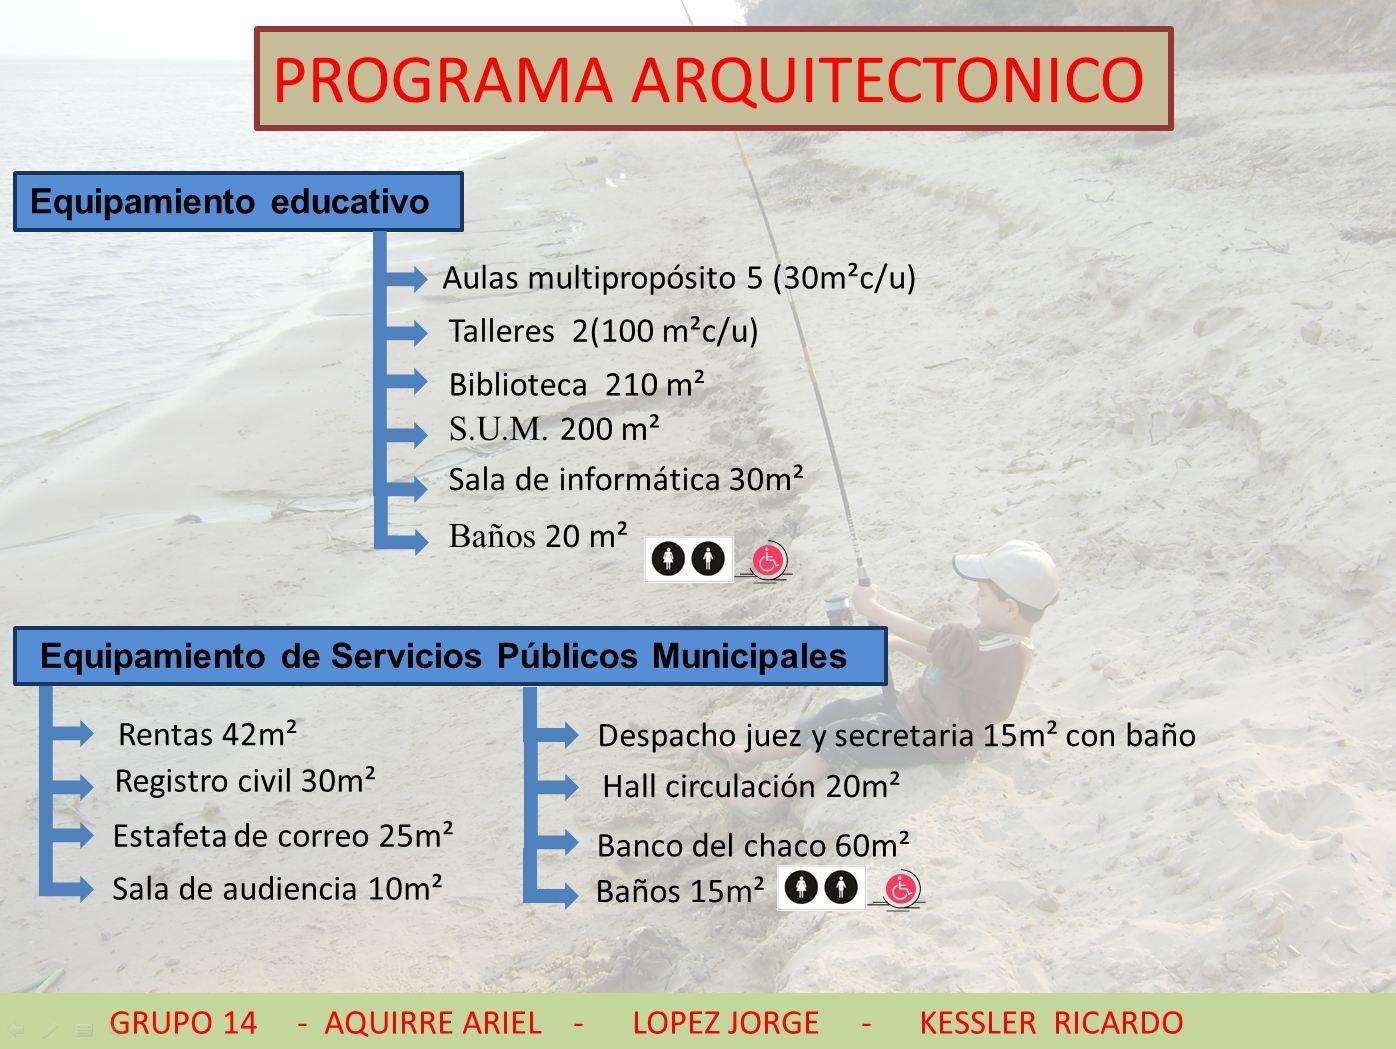 Arquitectura4 upa grupo 14 programa arquitectonico for Biblioteca programa arquitectonico